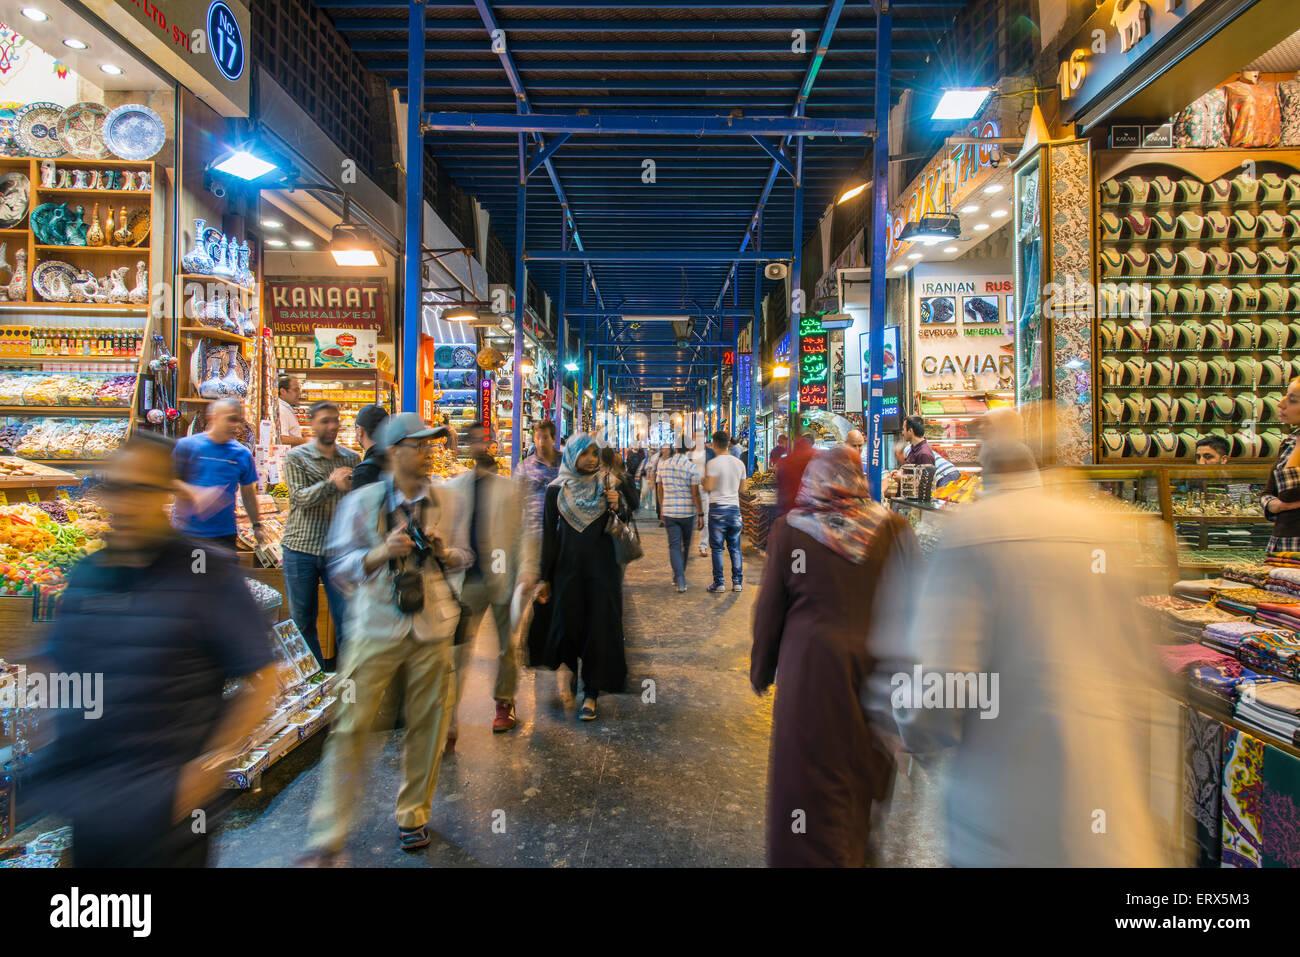 Interior view of the Spice Bazaar or Egyptian Bazaar, Istanbul, Turkey - Stock Image